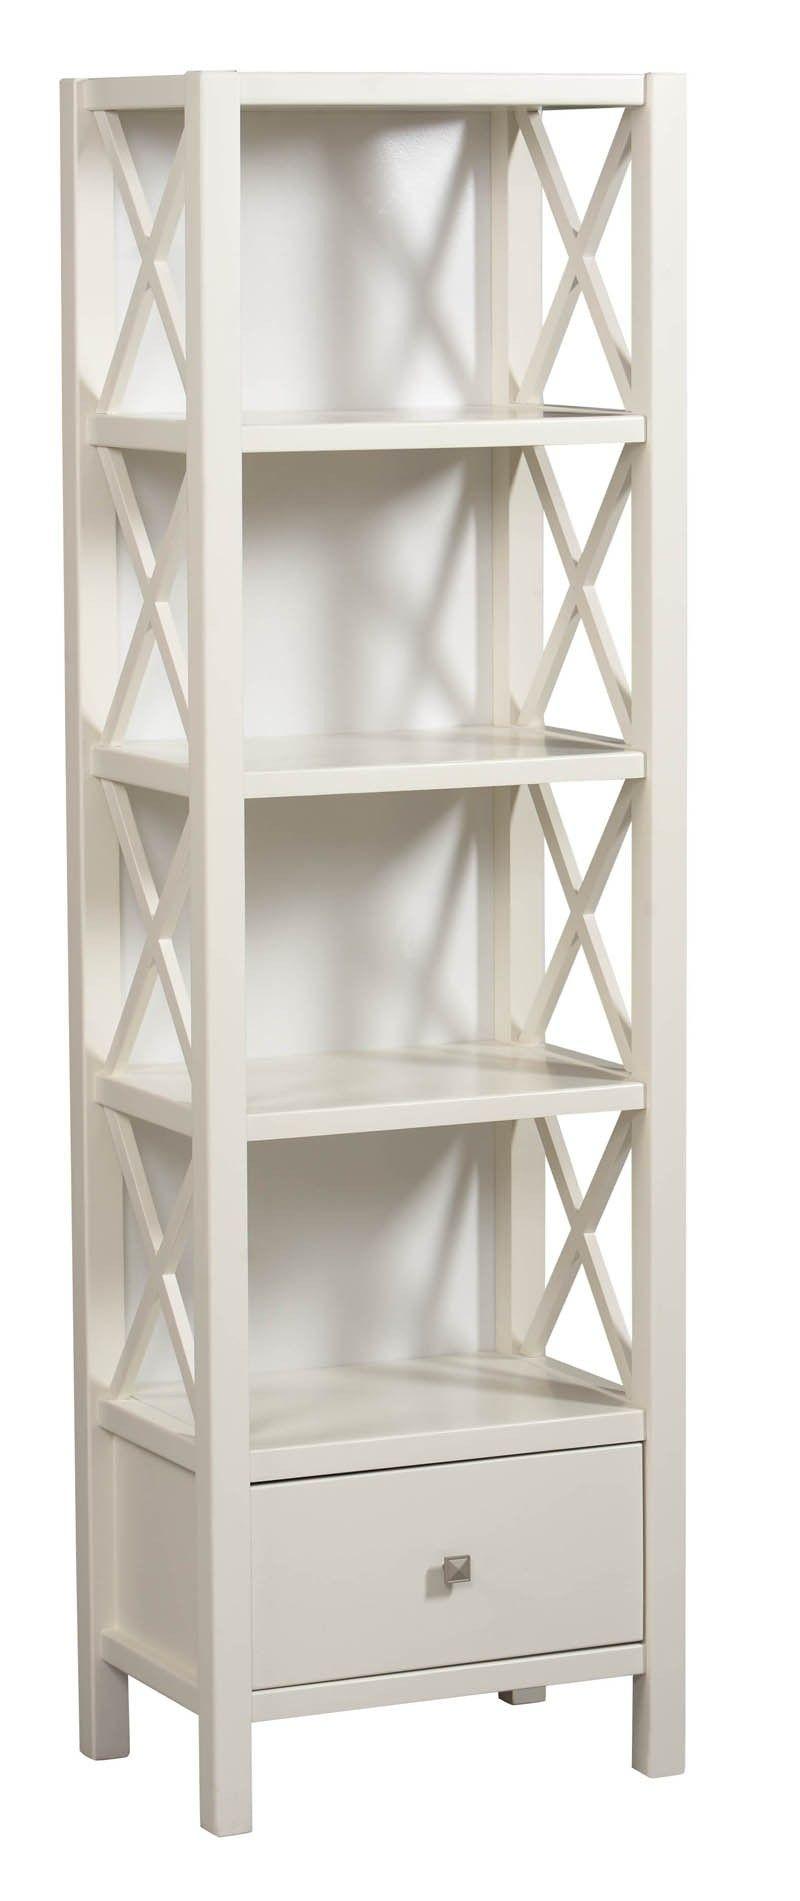 lancaster 5 shelf narrow bookcase white 22 w x 25 d x 72 h 278 bathroom home bookshelves. Black Bedroom Furniture Sets. Home Design Ideas